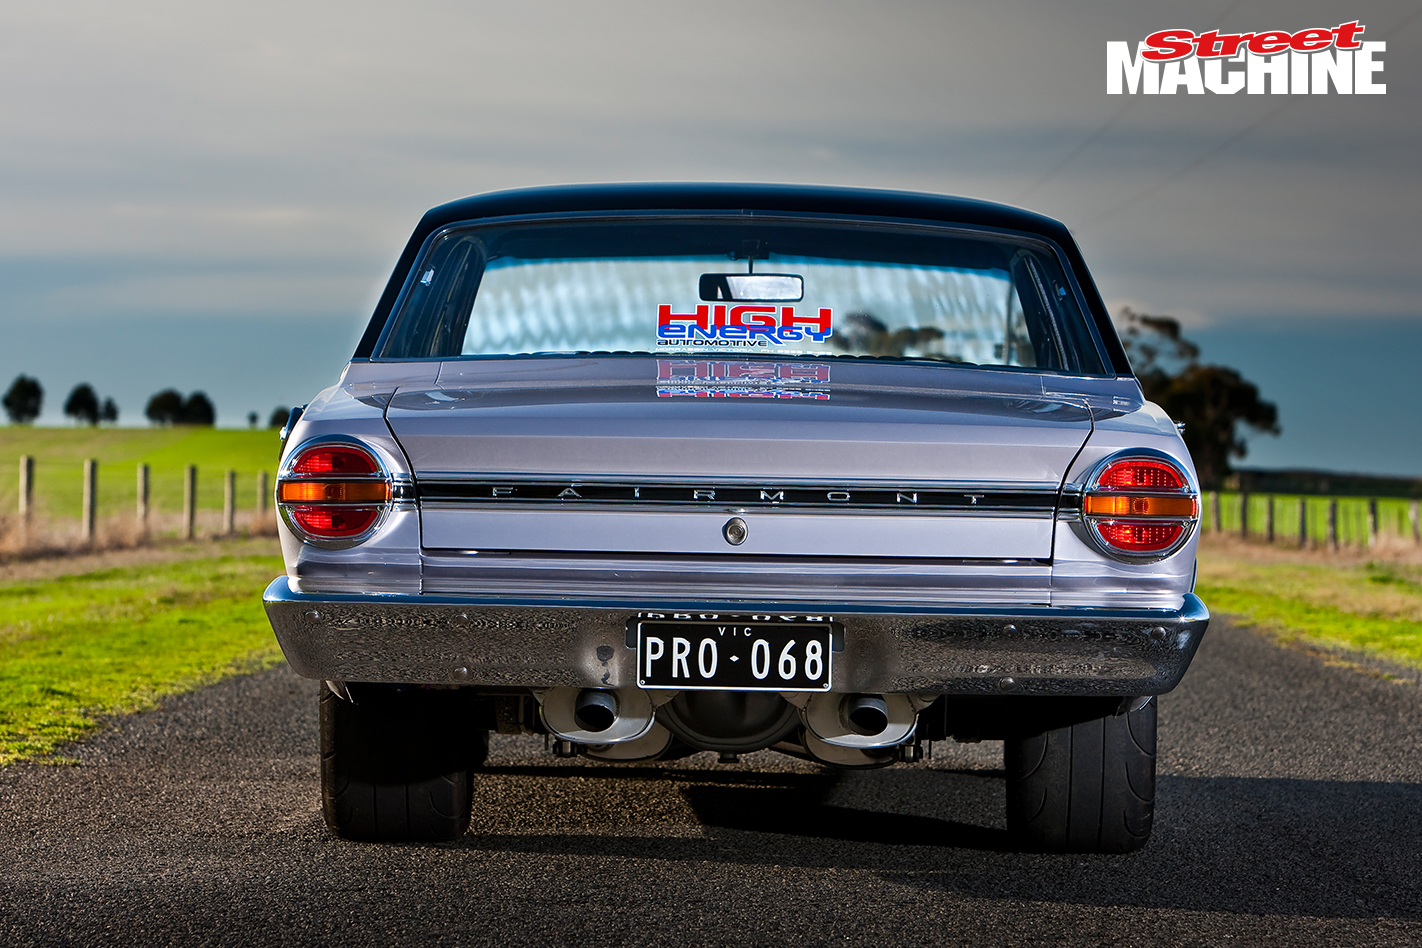 Ford XT Fairmont 9 Nw